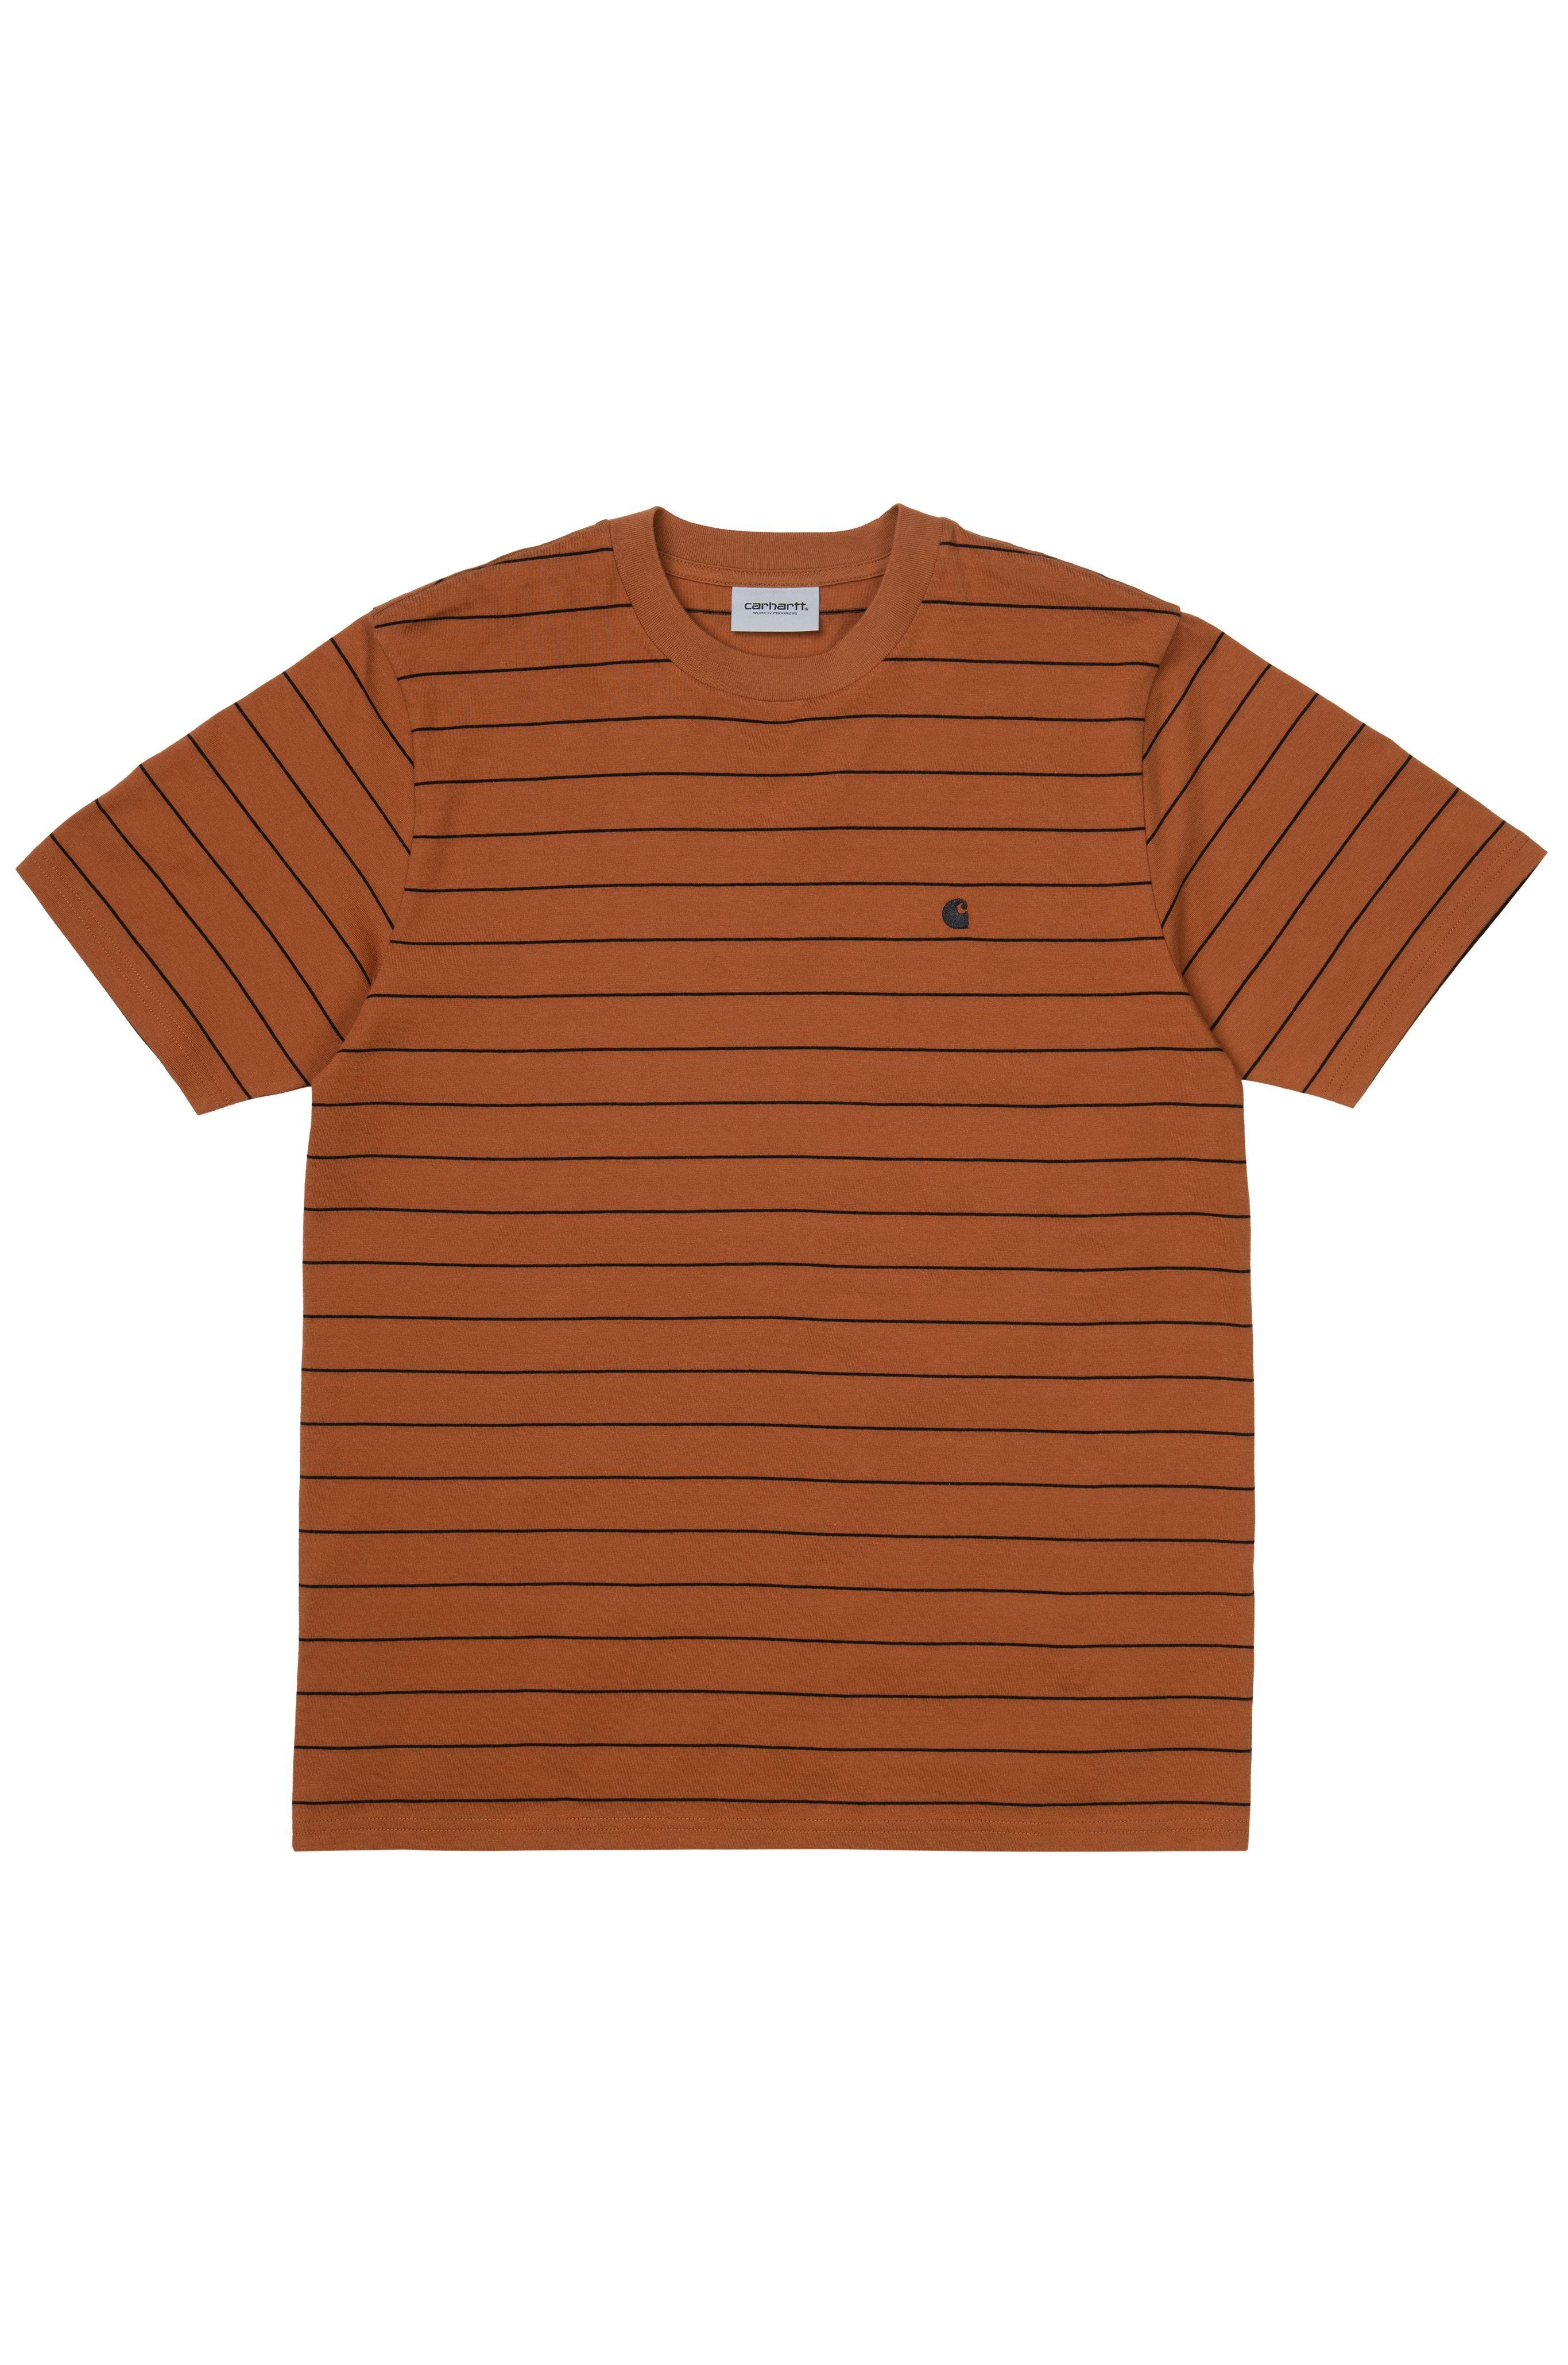 T-Shirt Carhartt WIP S/S DENTON T-SHIRT Denton Stripe, Rum/Black